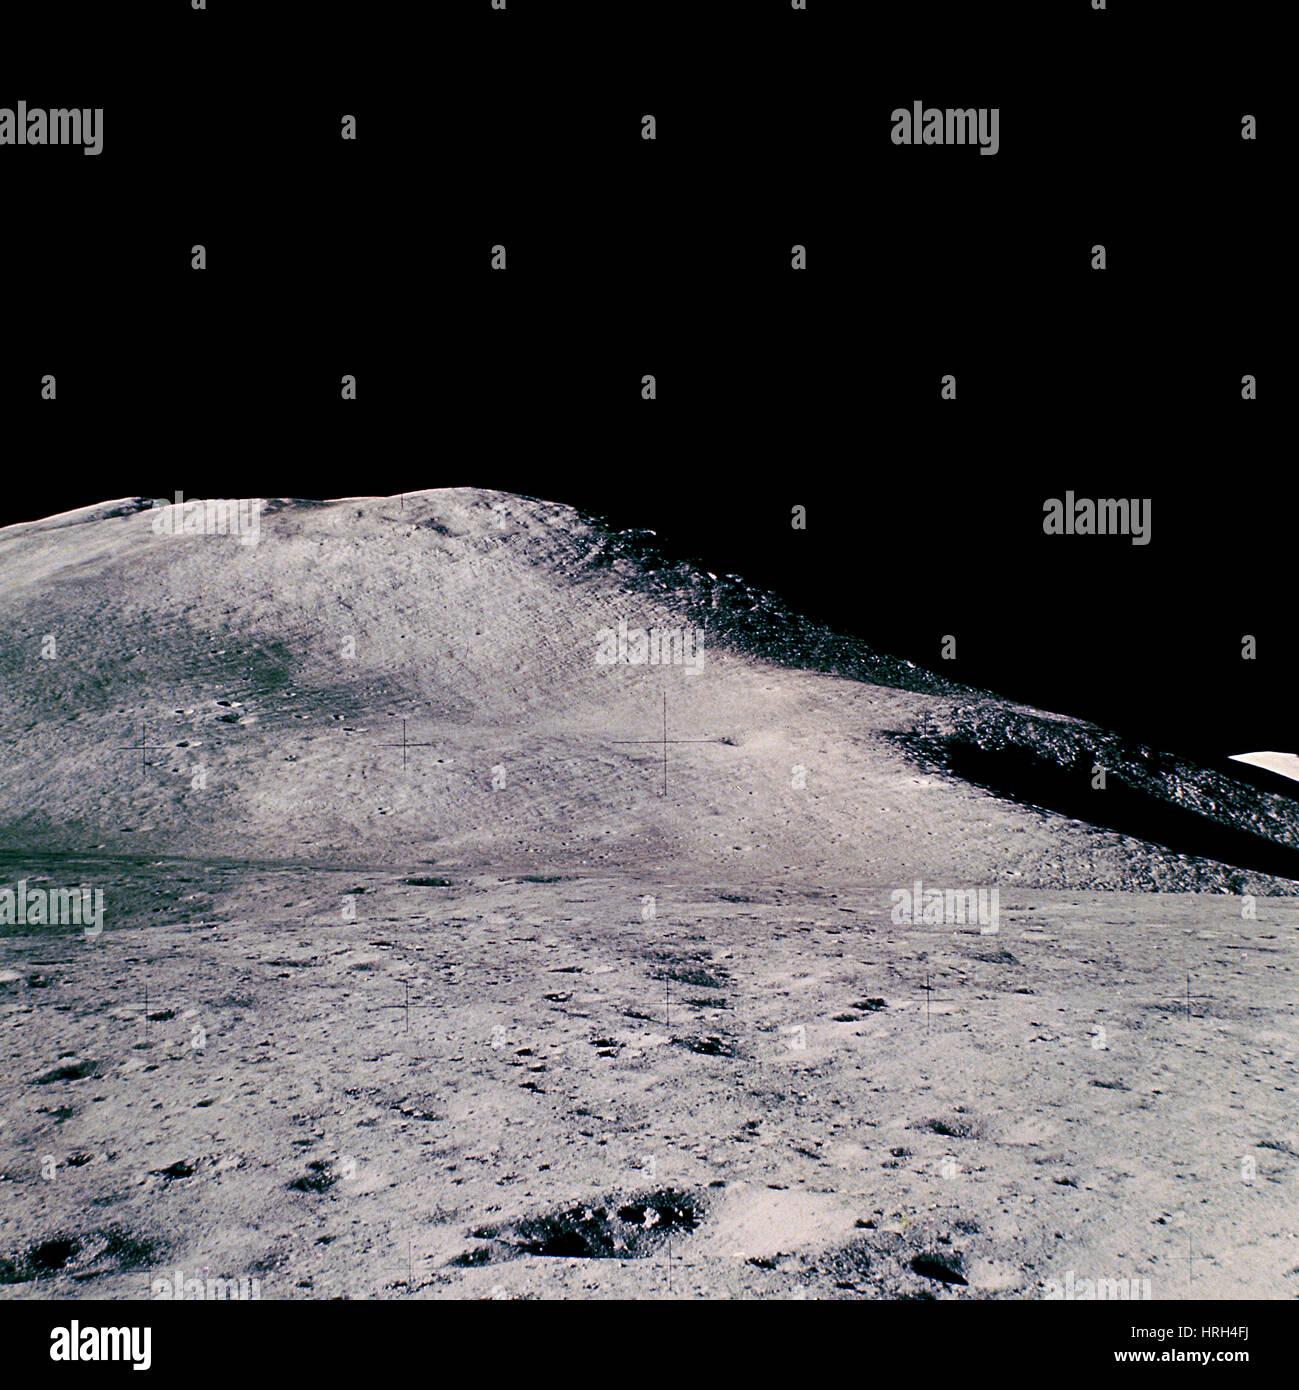 Paisaje lunar del Apolo 15 Imagen De Stock